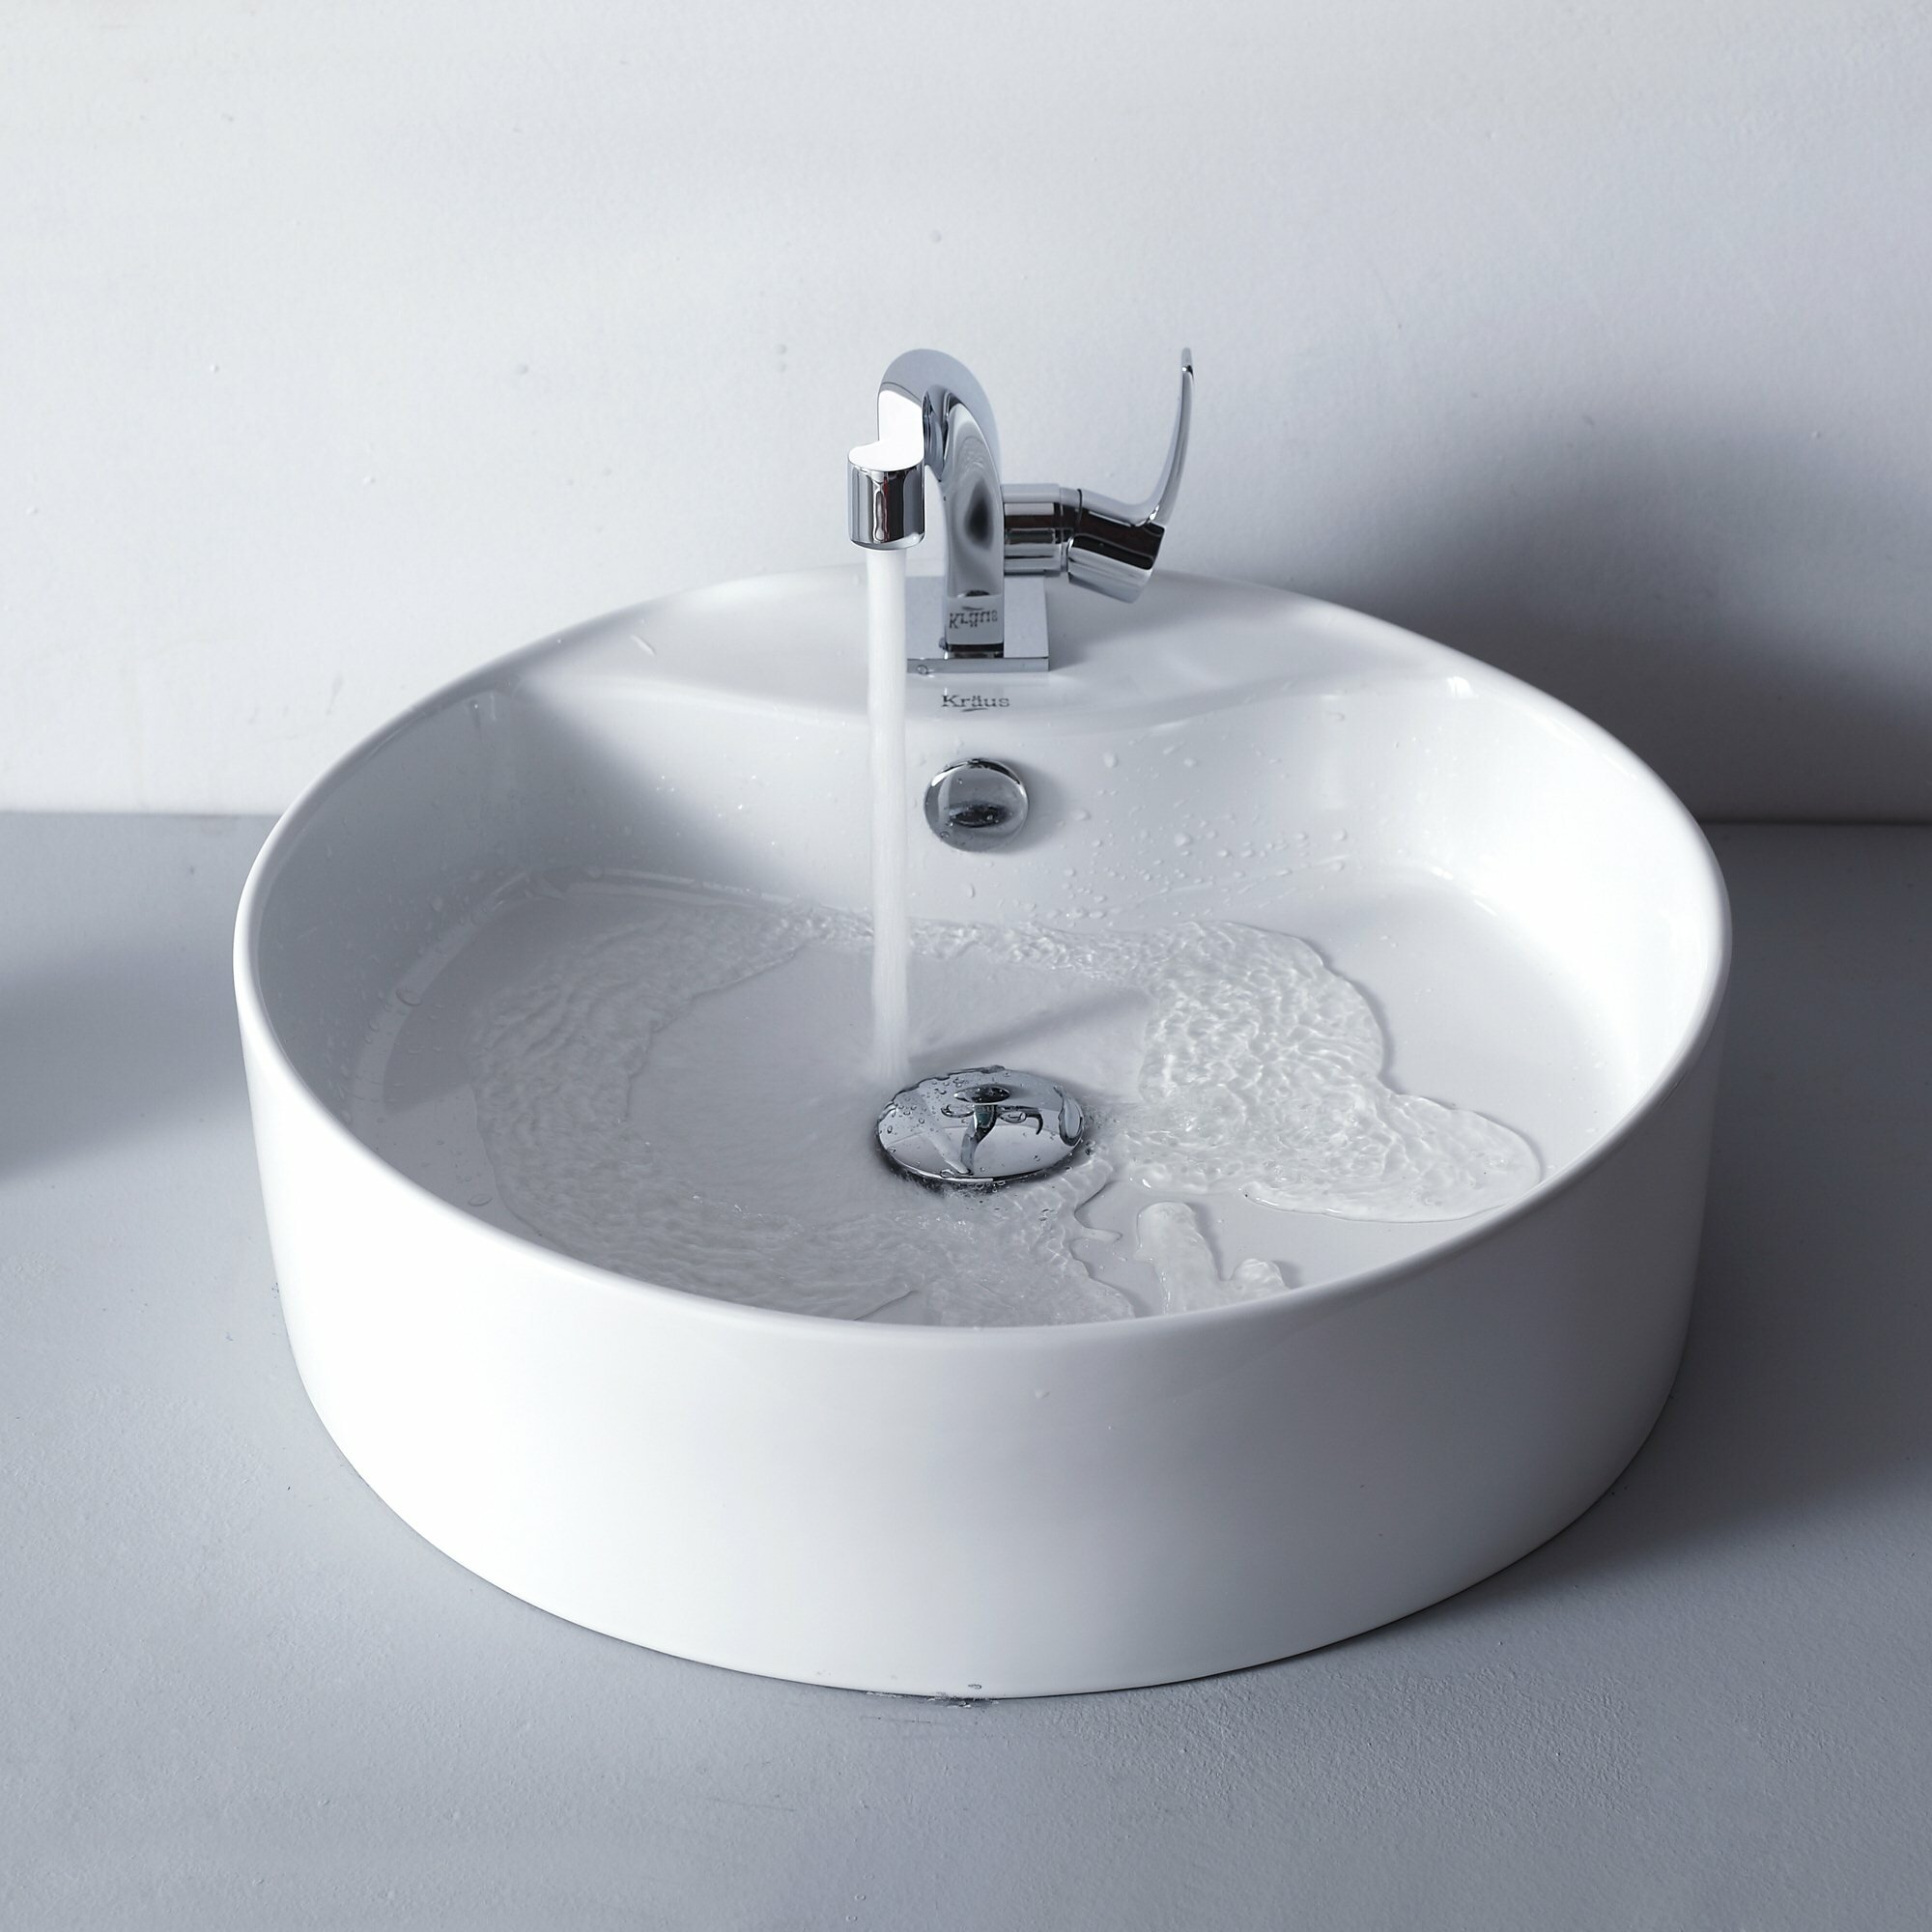 Kraus Typhon Single Handle Basin Bathroom Faucet With Pop Up Drain Reviews Wayfair